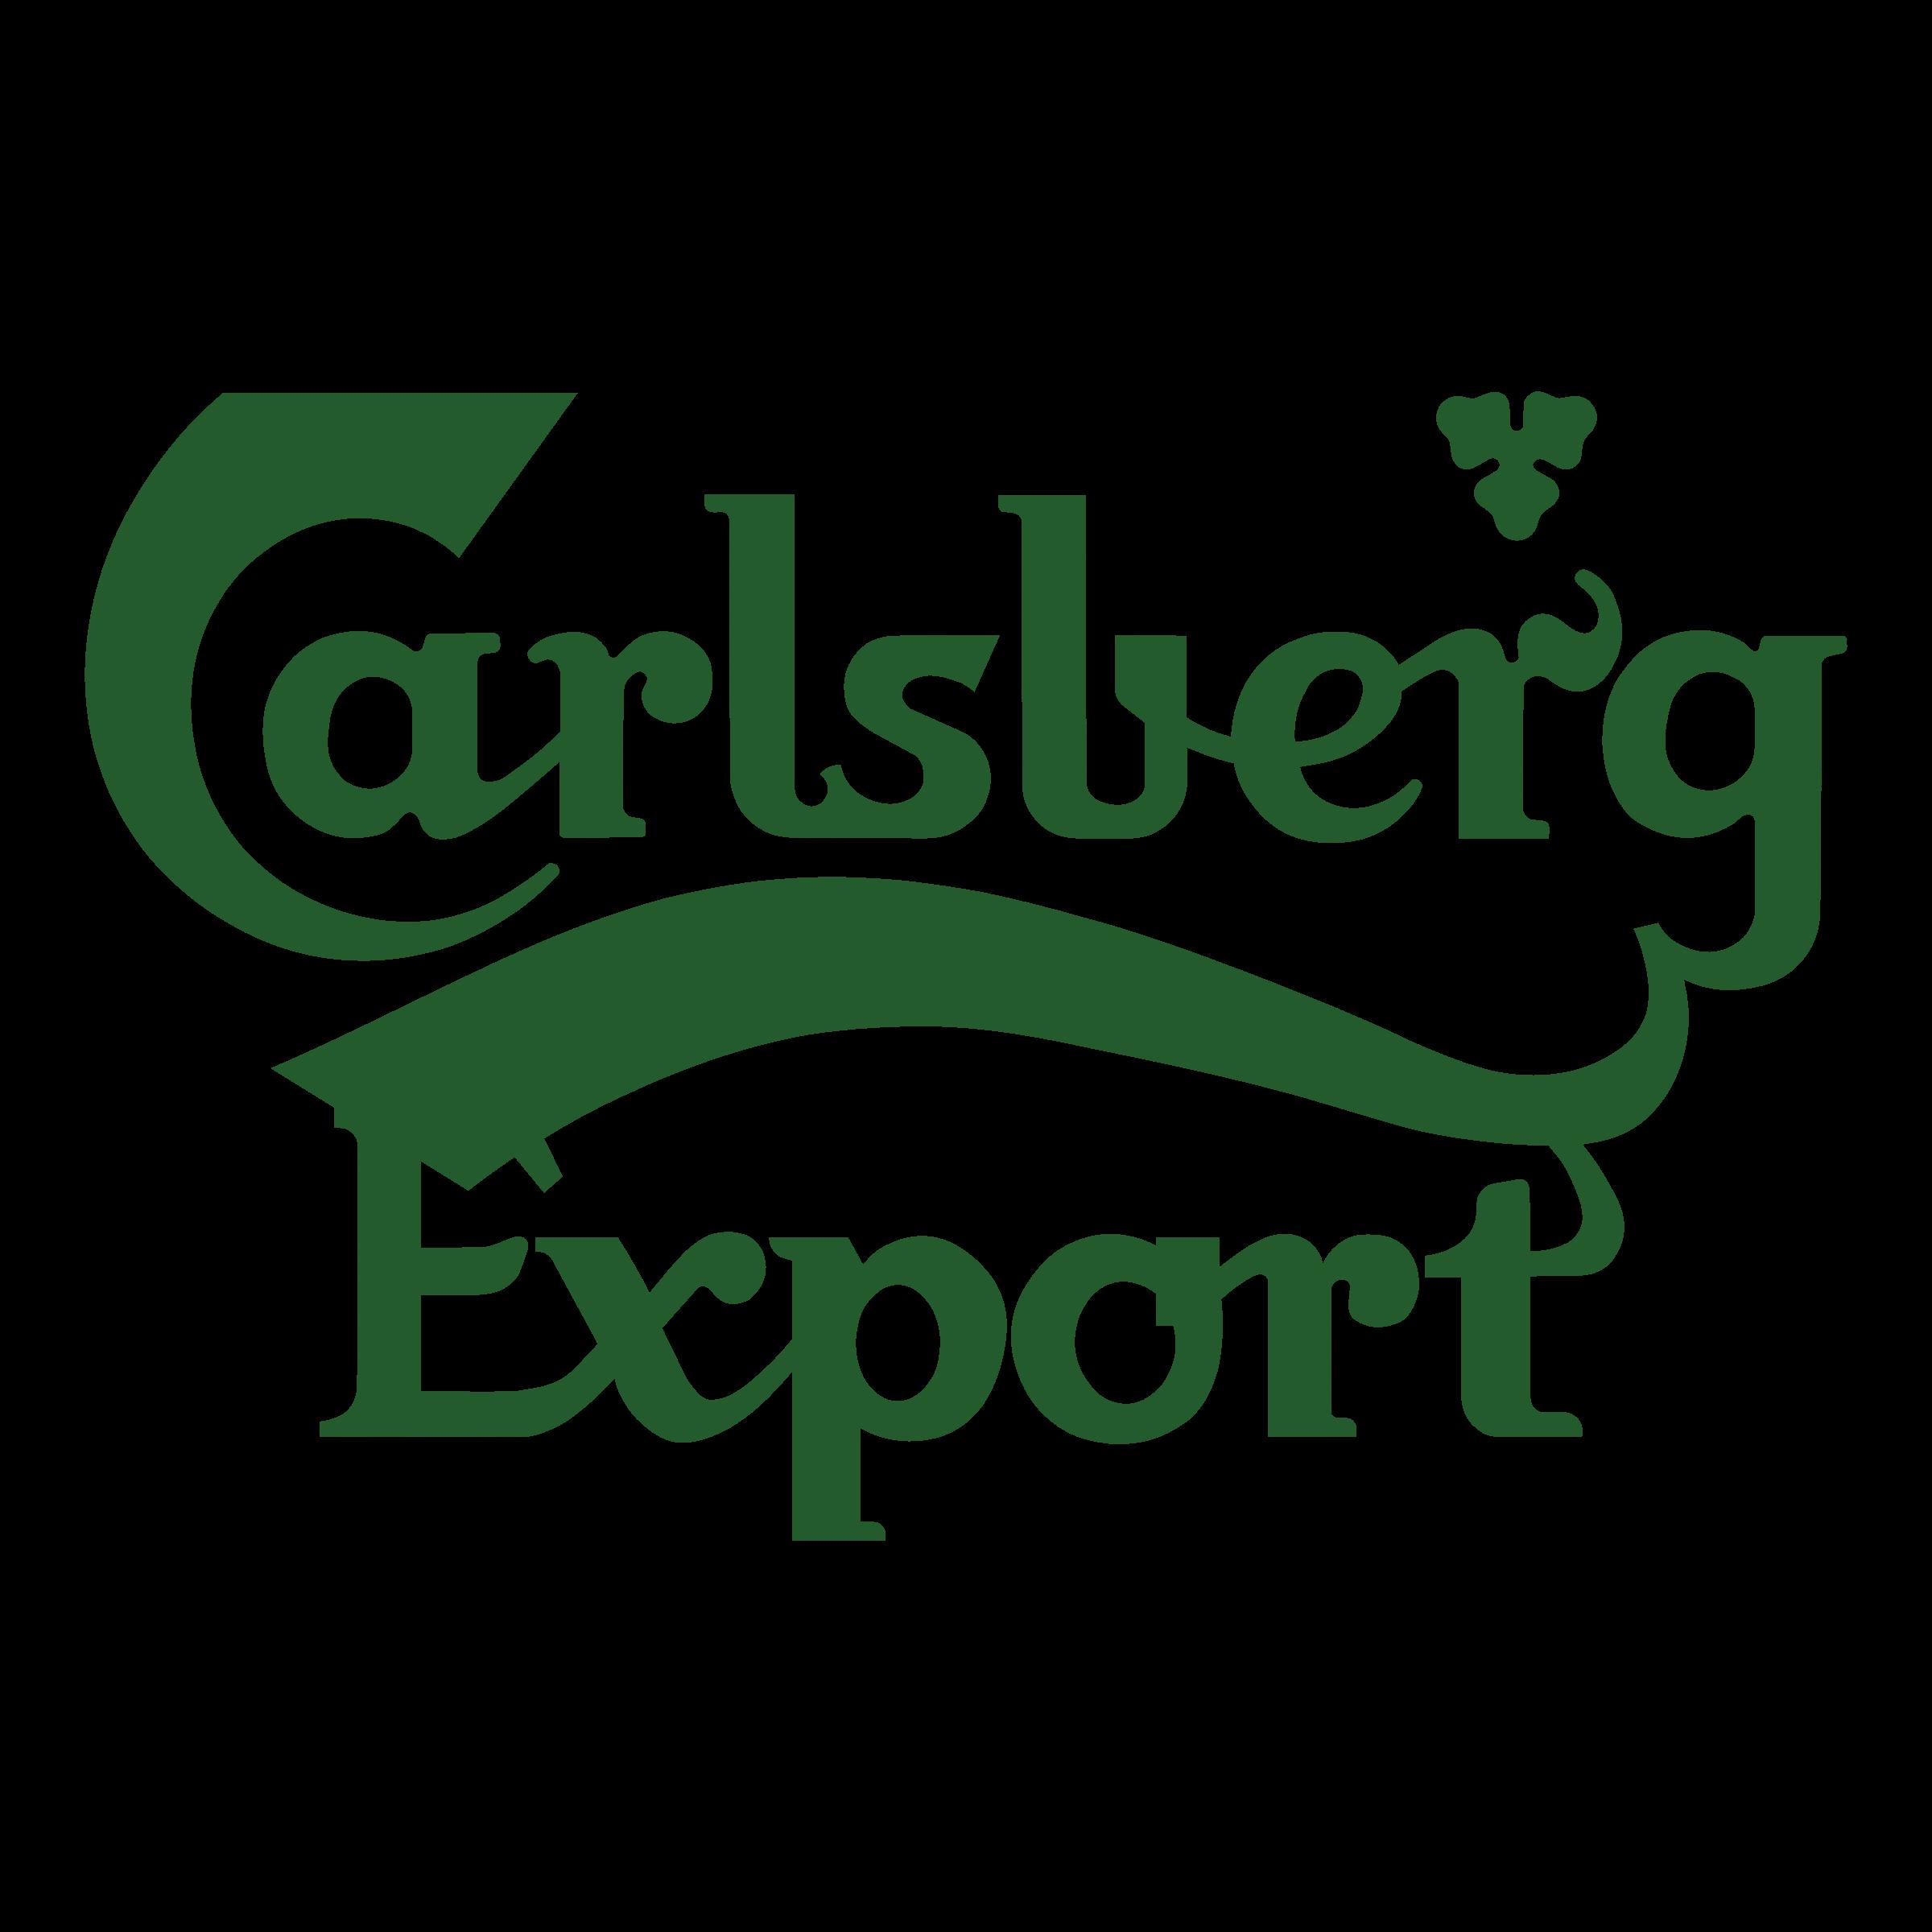 Carlsberg Logo Png Transparent & Svg Vector   Pluspng Pluspng.com - Carlsberg, Transparent background PNG HD thumbnail